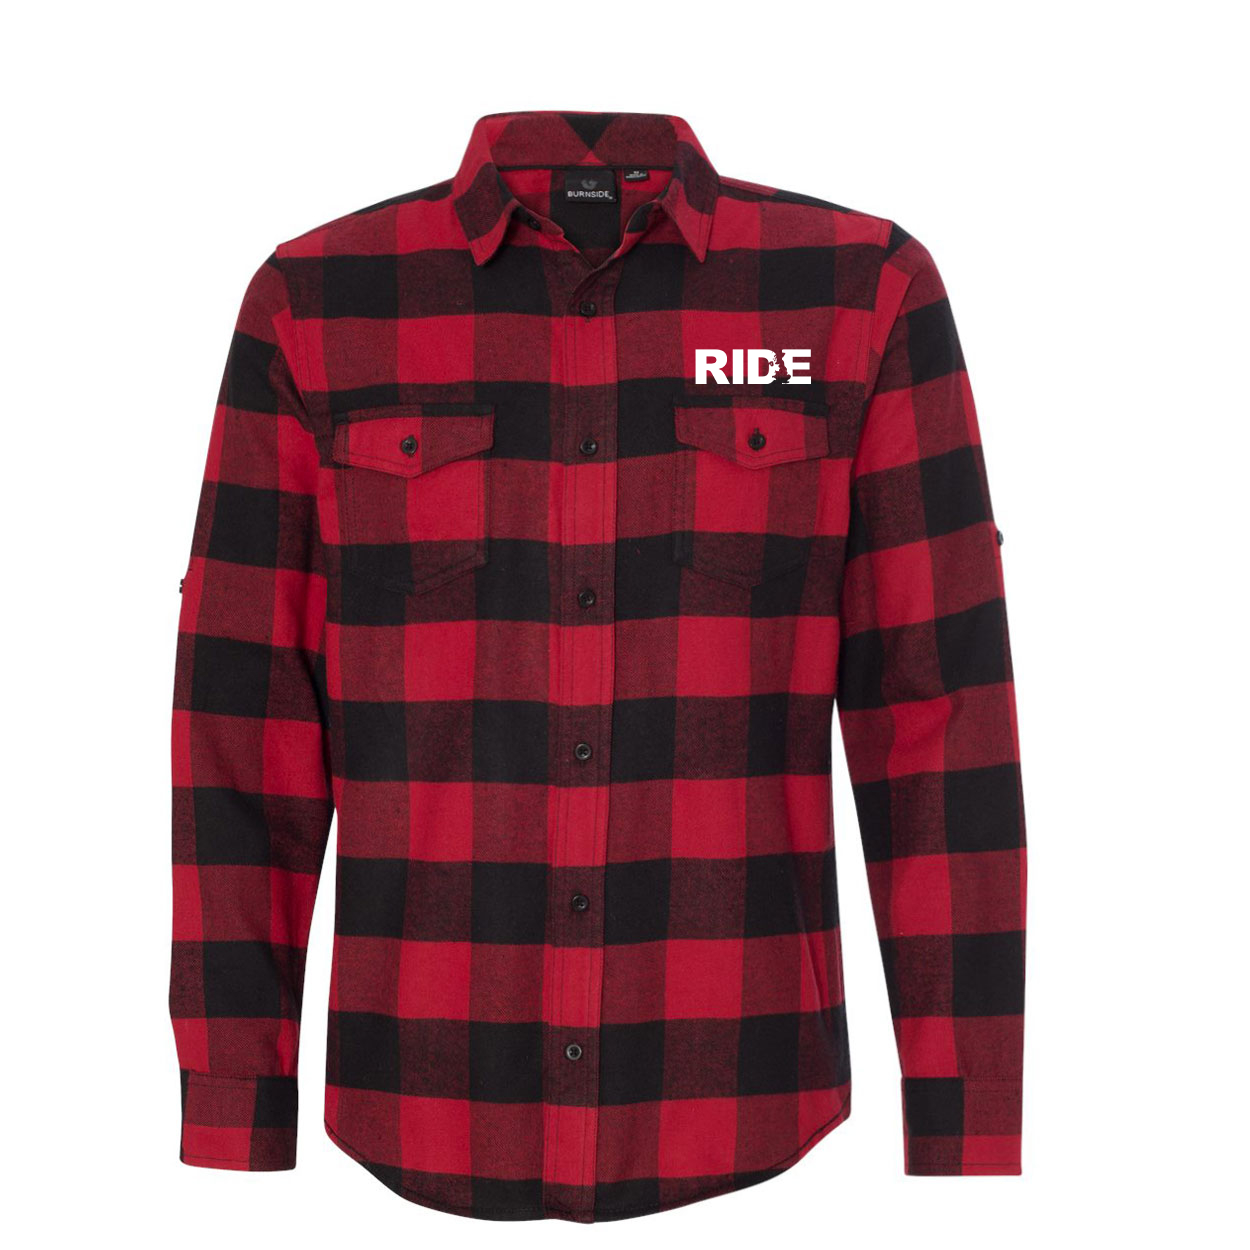 Ride United Kingdom Classic Unisex Long Sleeve Flannel Shirt Red/Black Buffalo (White Logo)